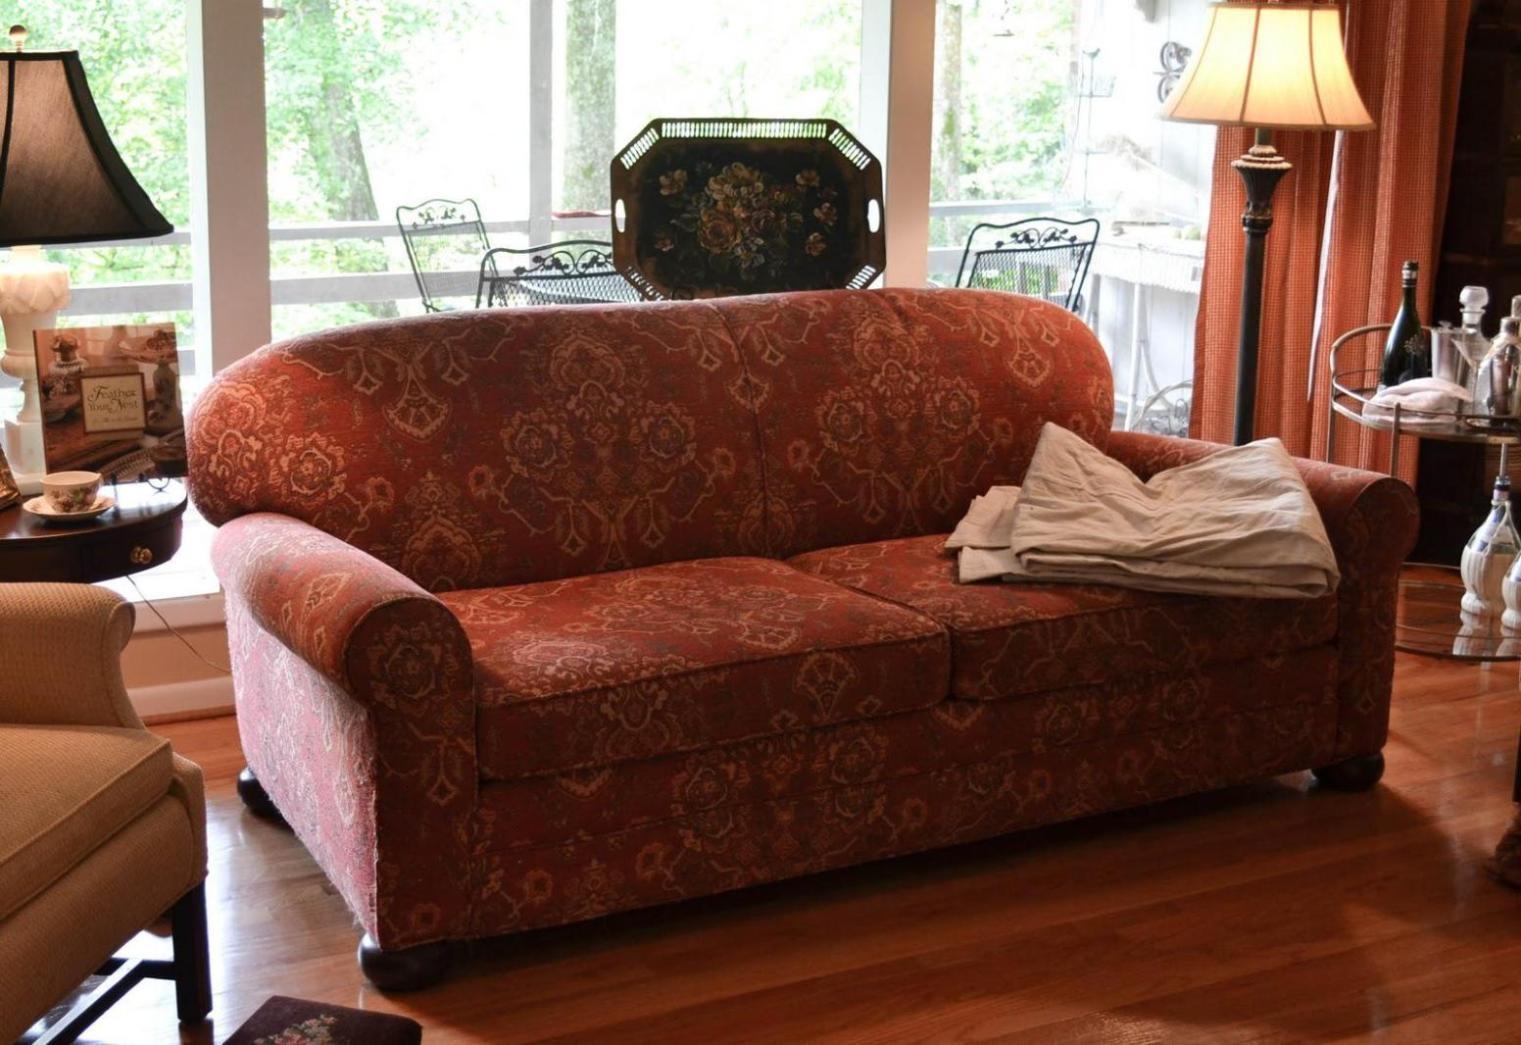 Loveseat Slipcover T Cushion : Doherty House – Contemporary For Loveseat Slipcovers T Cushion (View 19 of 20)